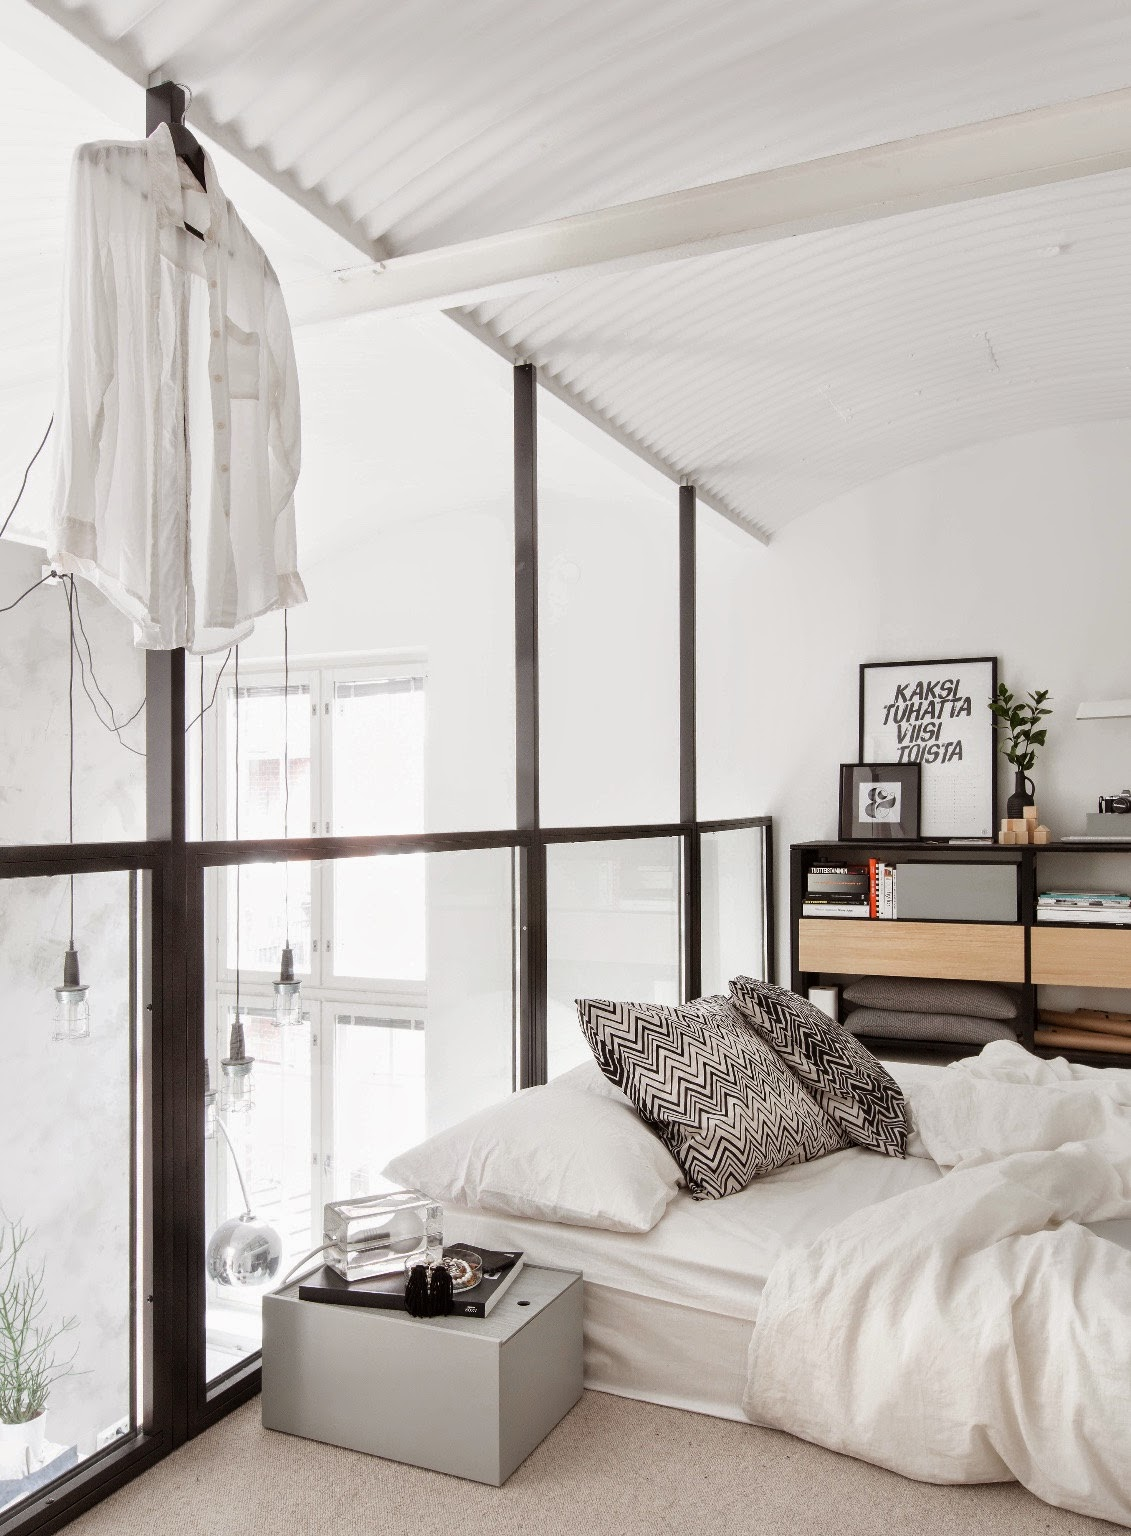 Black And White Loft In Finland